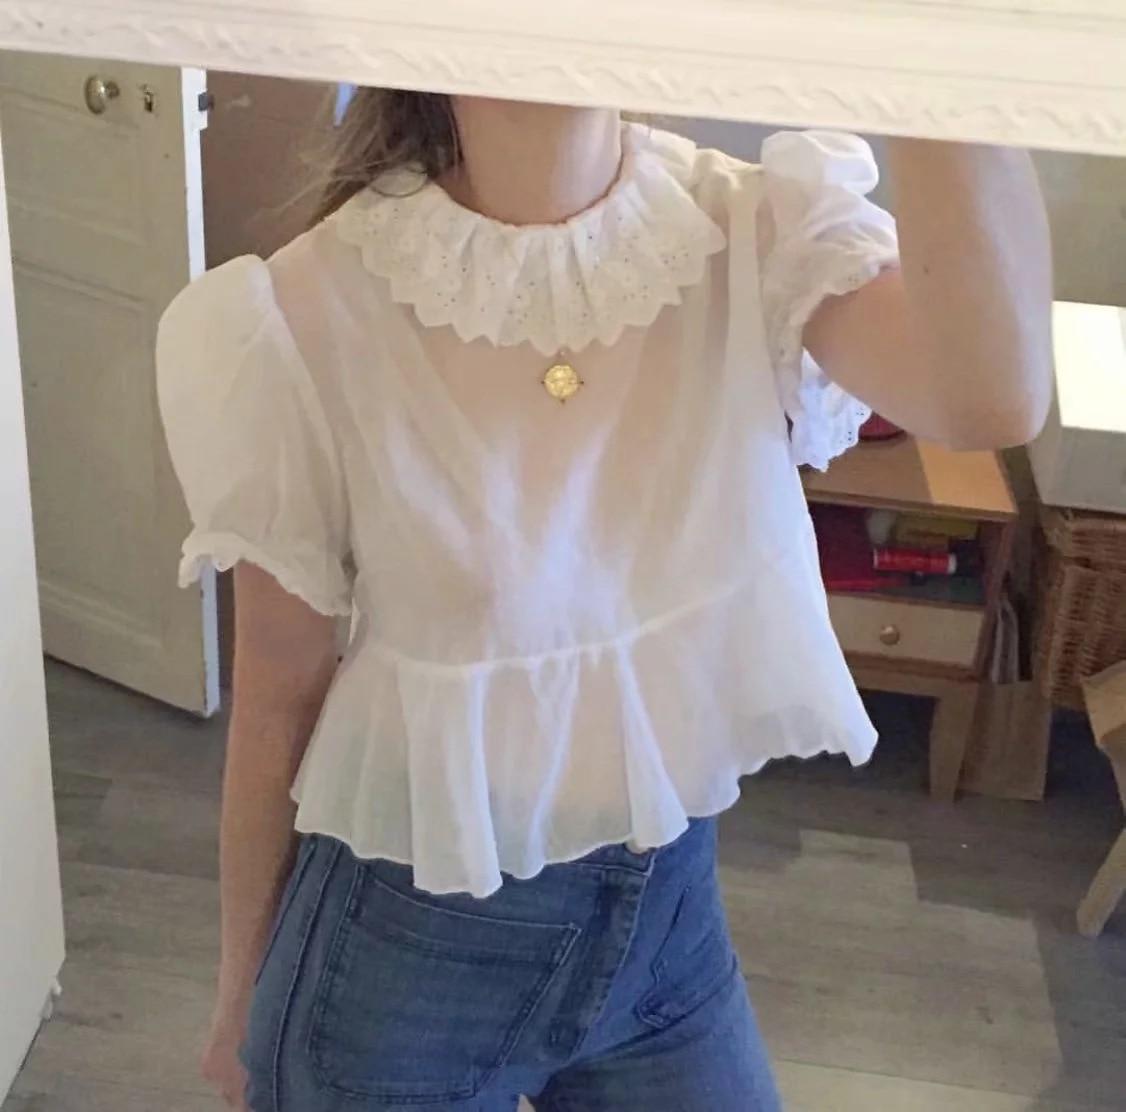 2019-summer-new-women-t-shirt-retro-lace-collar-cardigan-tie-tshirt-t-shirt-font-b-pokemon-b-font-cotton-comfort